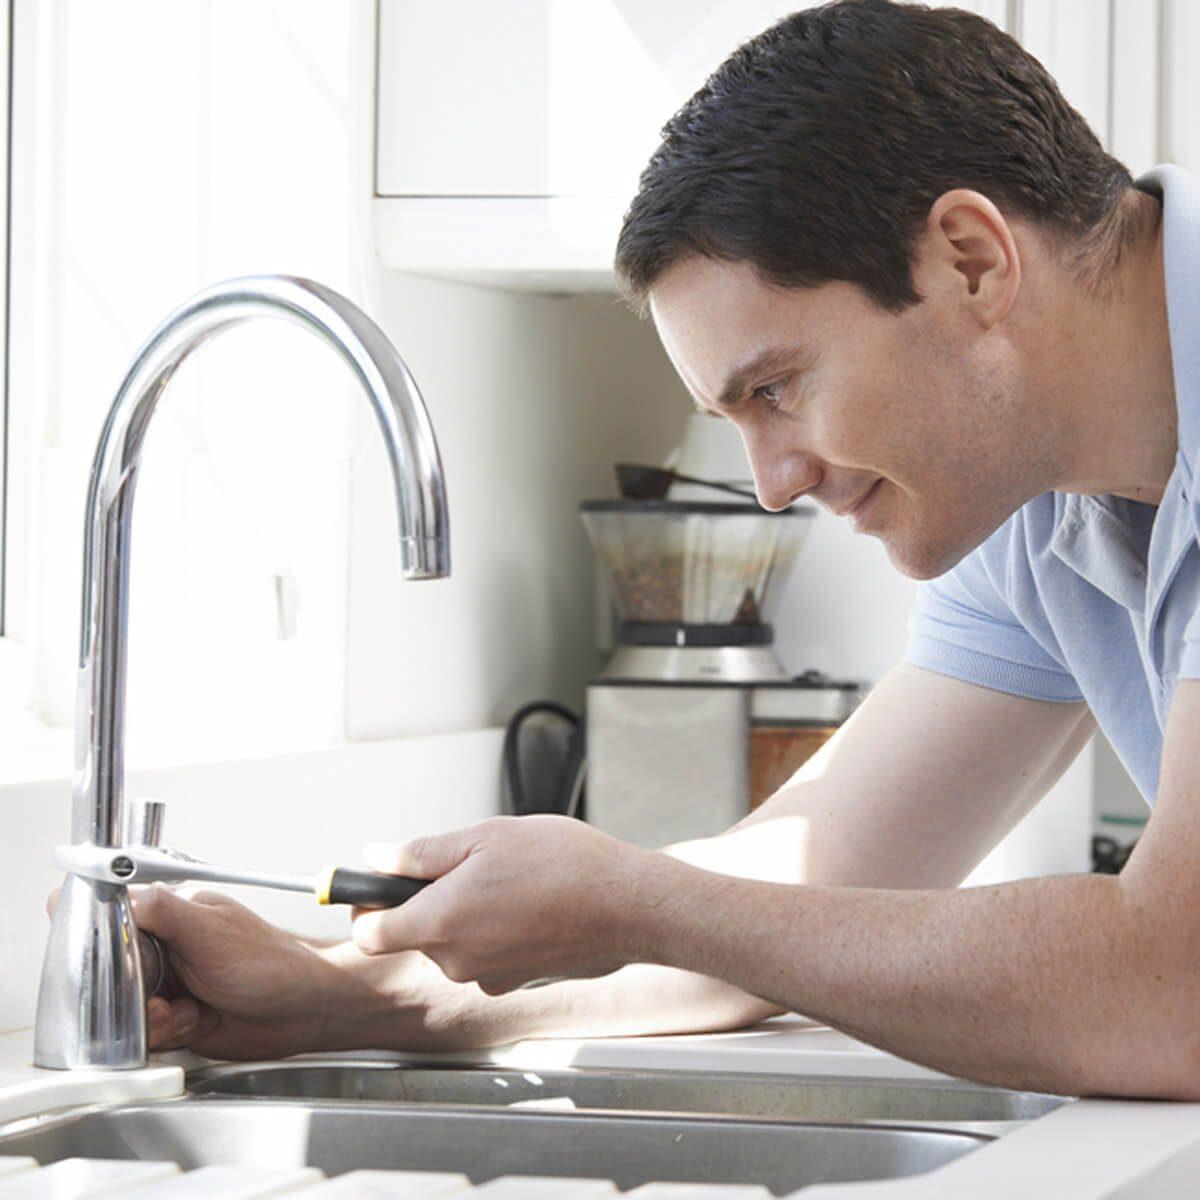 shutterstock_227581678 fix a leaky faucet kitchen sink